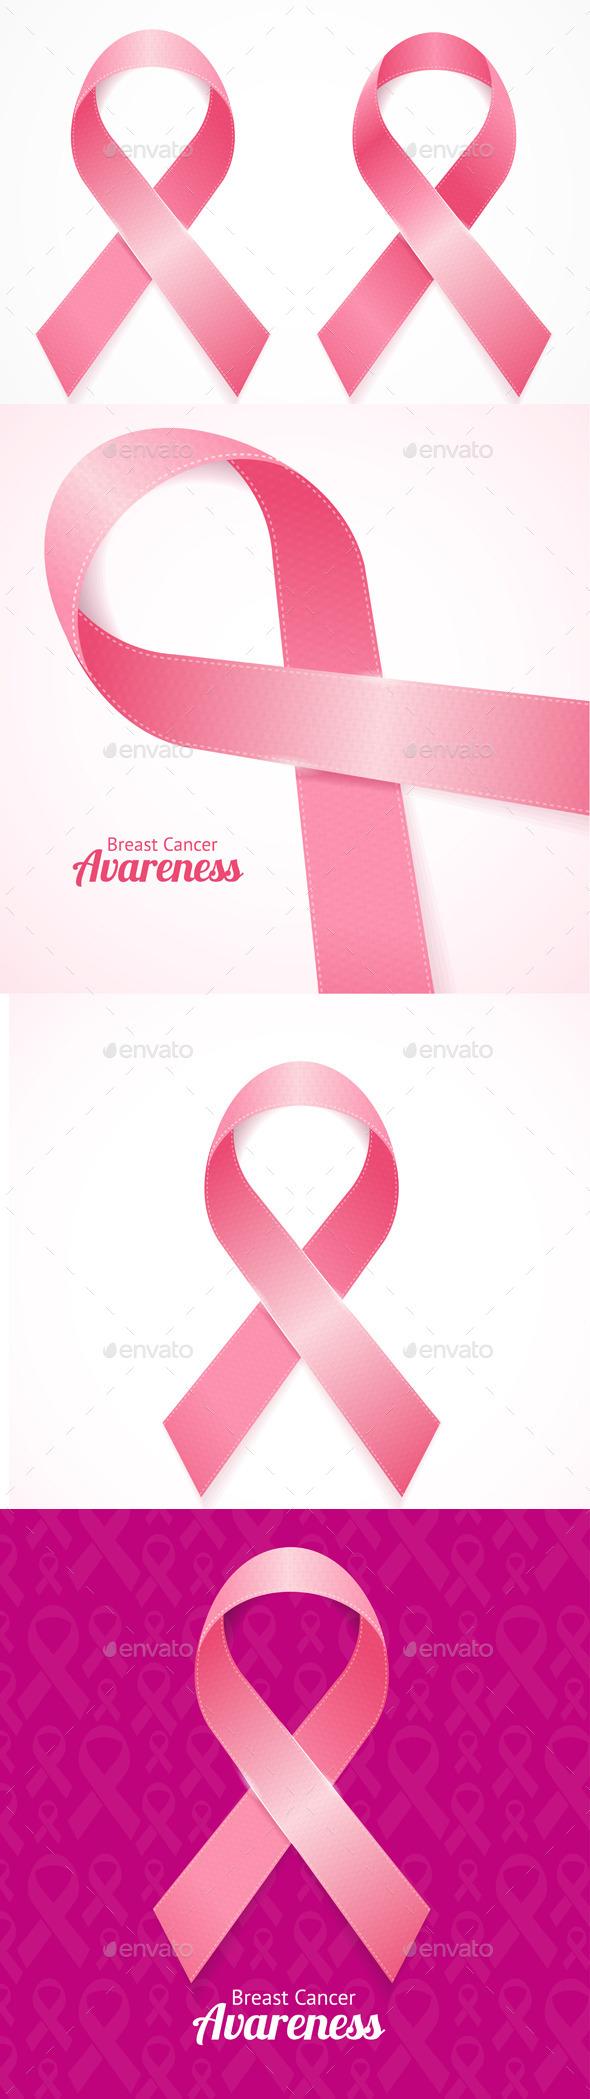 Breast Cancer Ribbon Set - Health/Medicine Conceptual